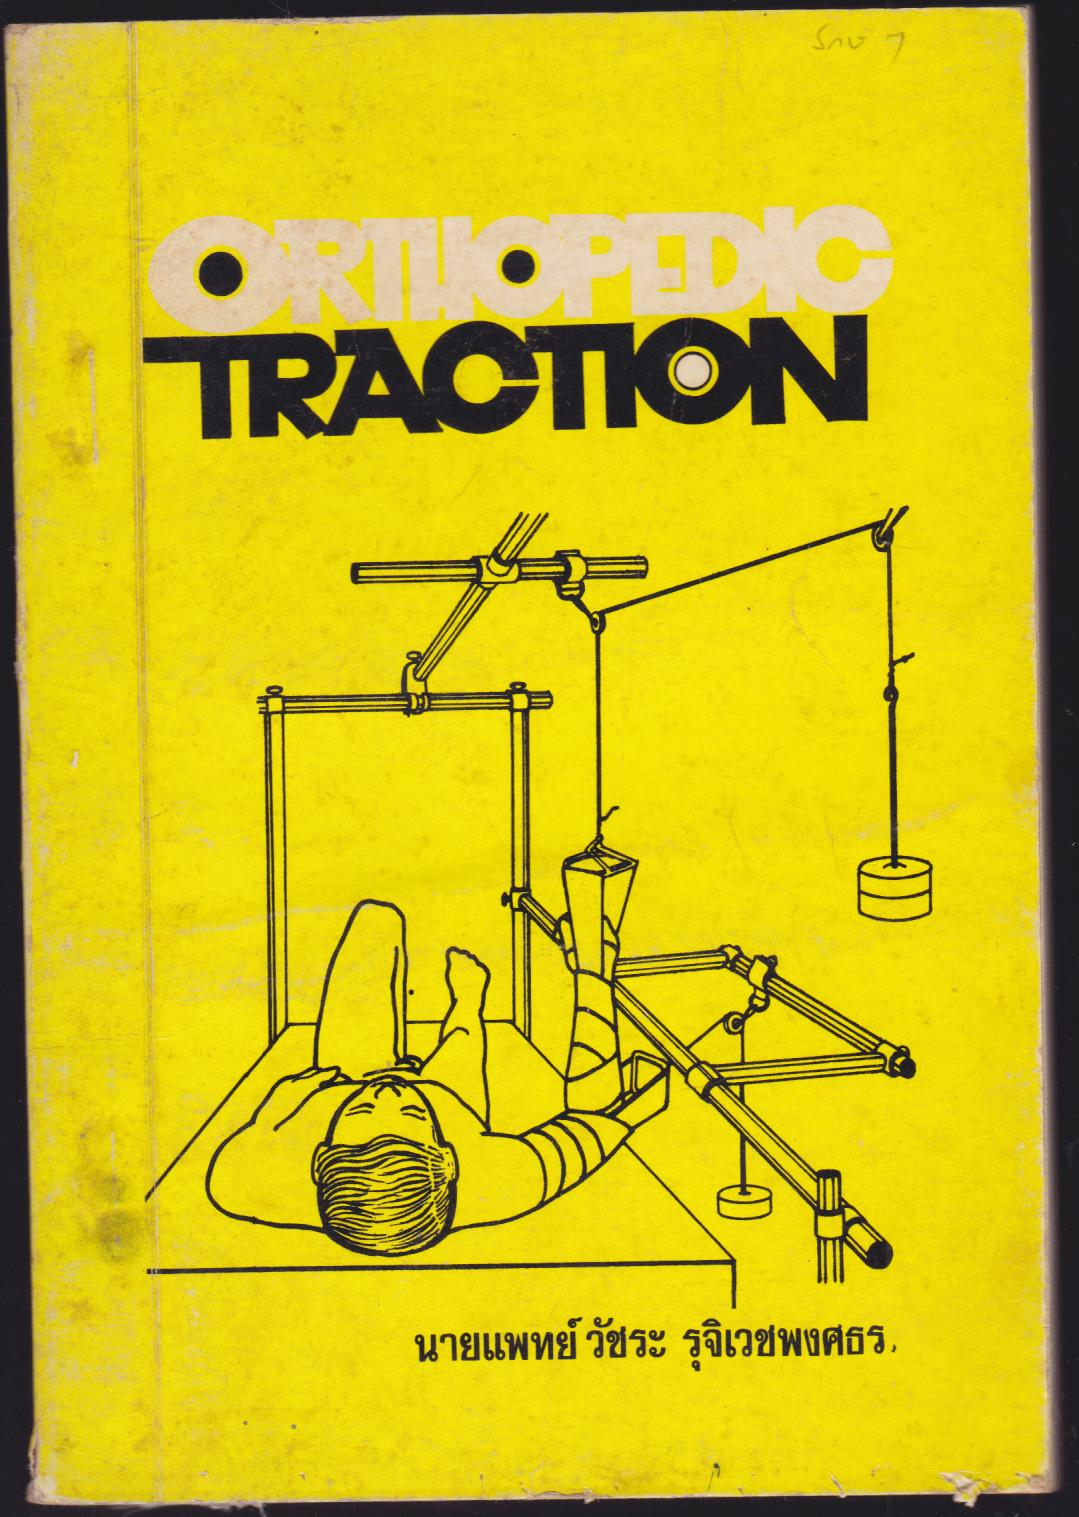 ORTHOPEDIC TRACTION